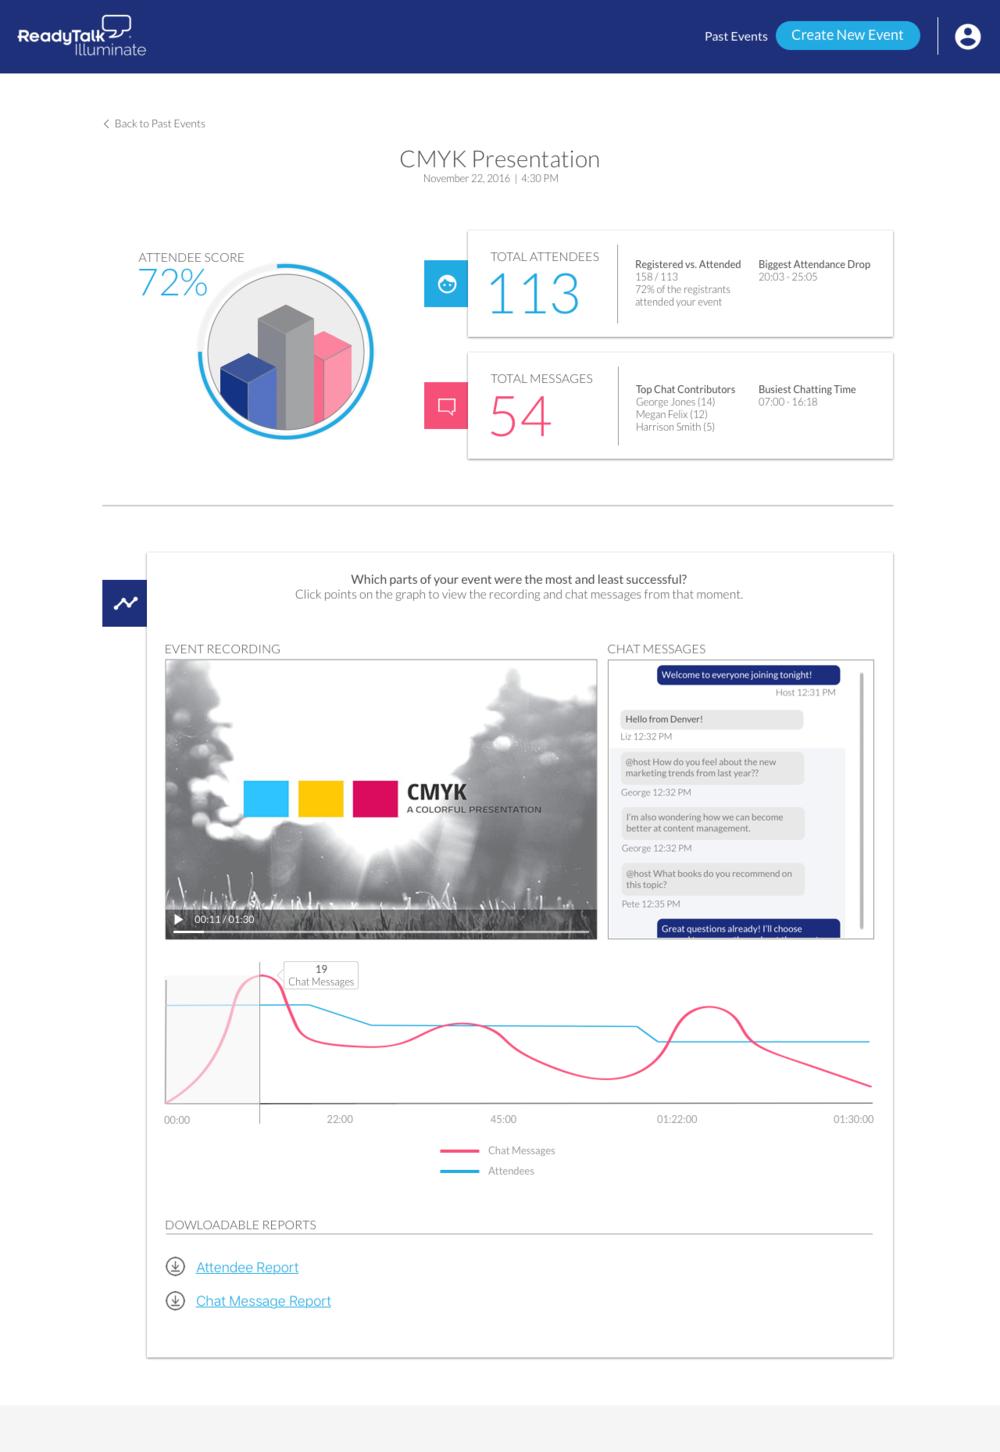 Analytics Interface